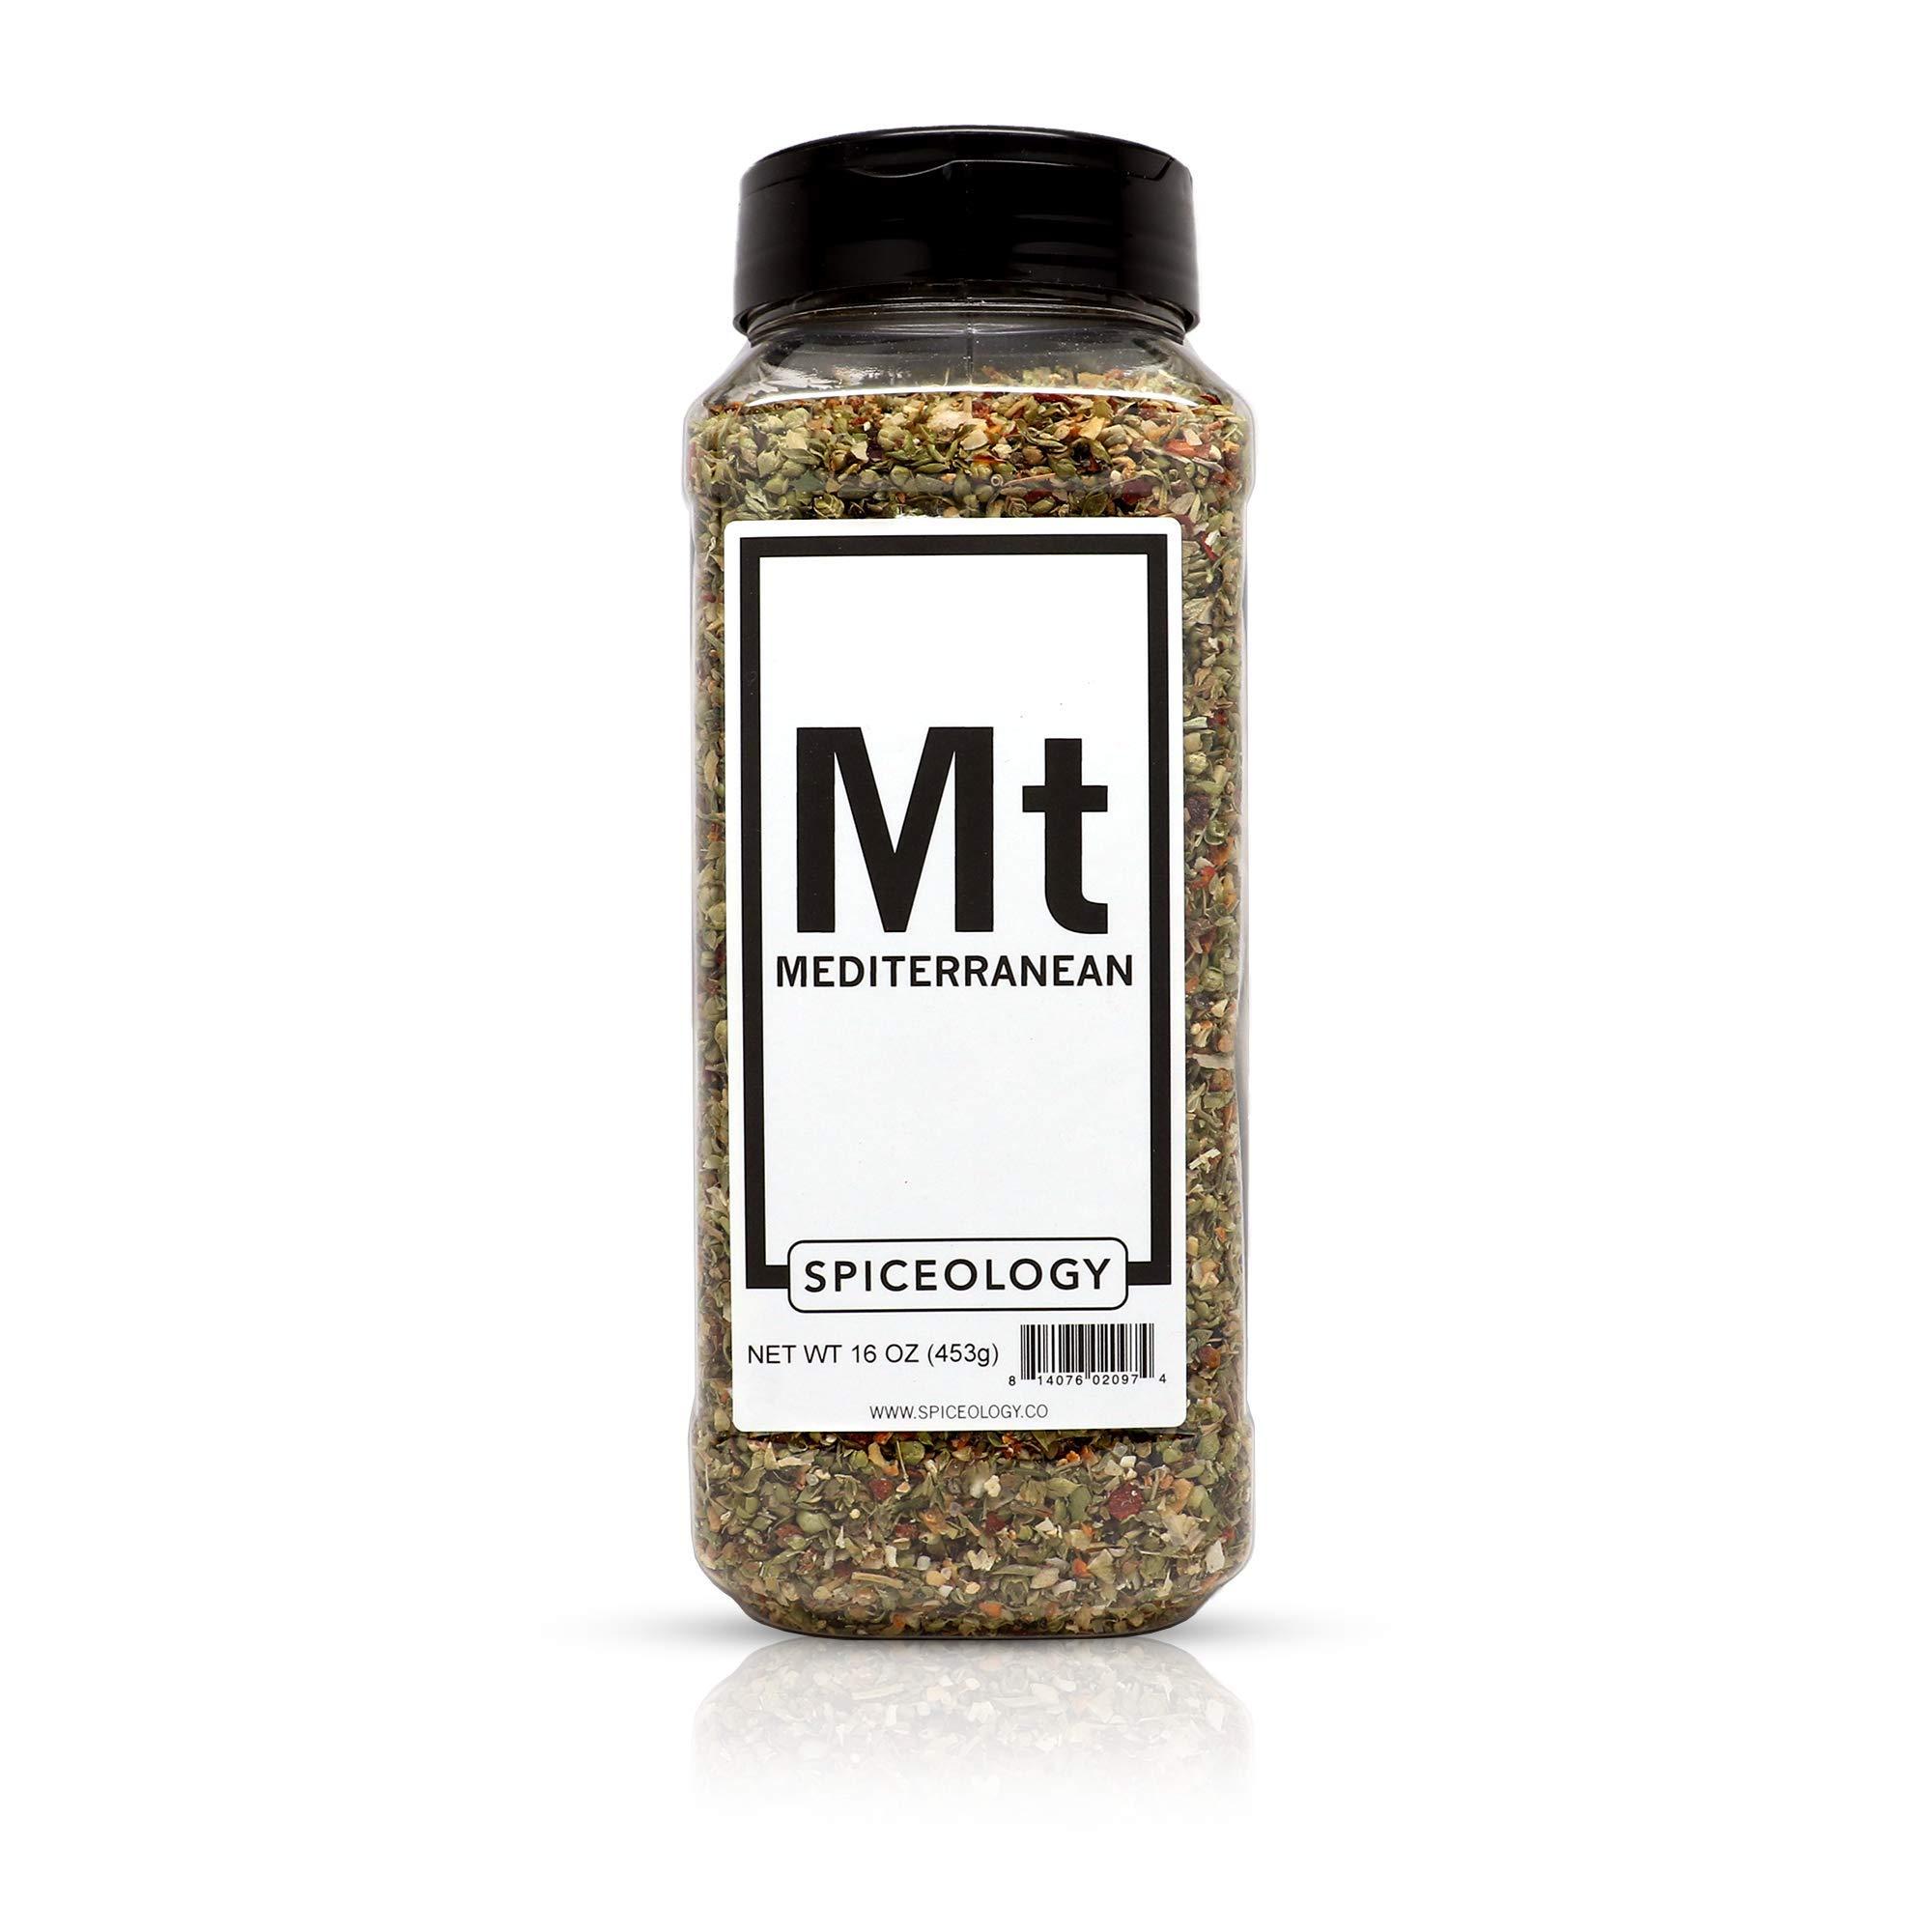 Mediterranean Spice Blend - Spiceology Greek Herb and Garlic Seasoning -16 ounces by Spiceology